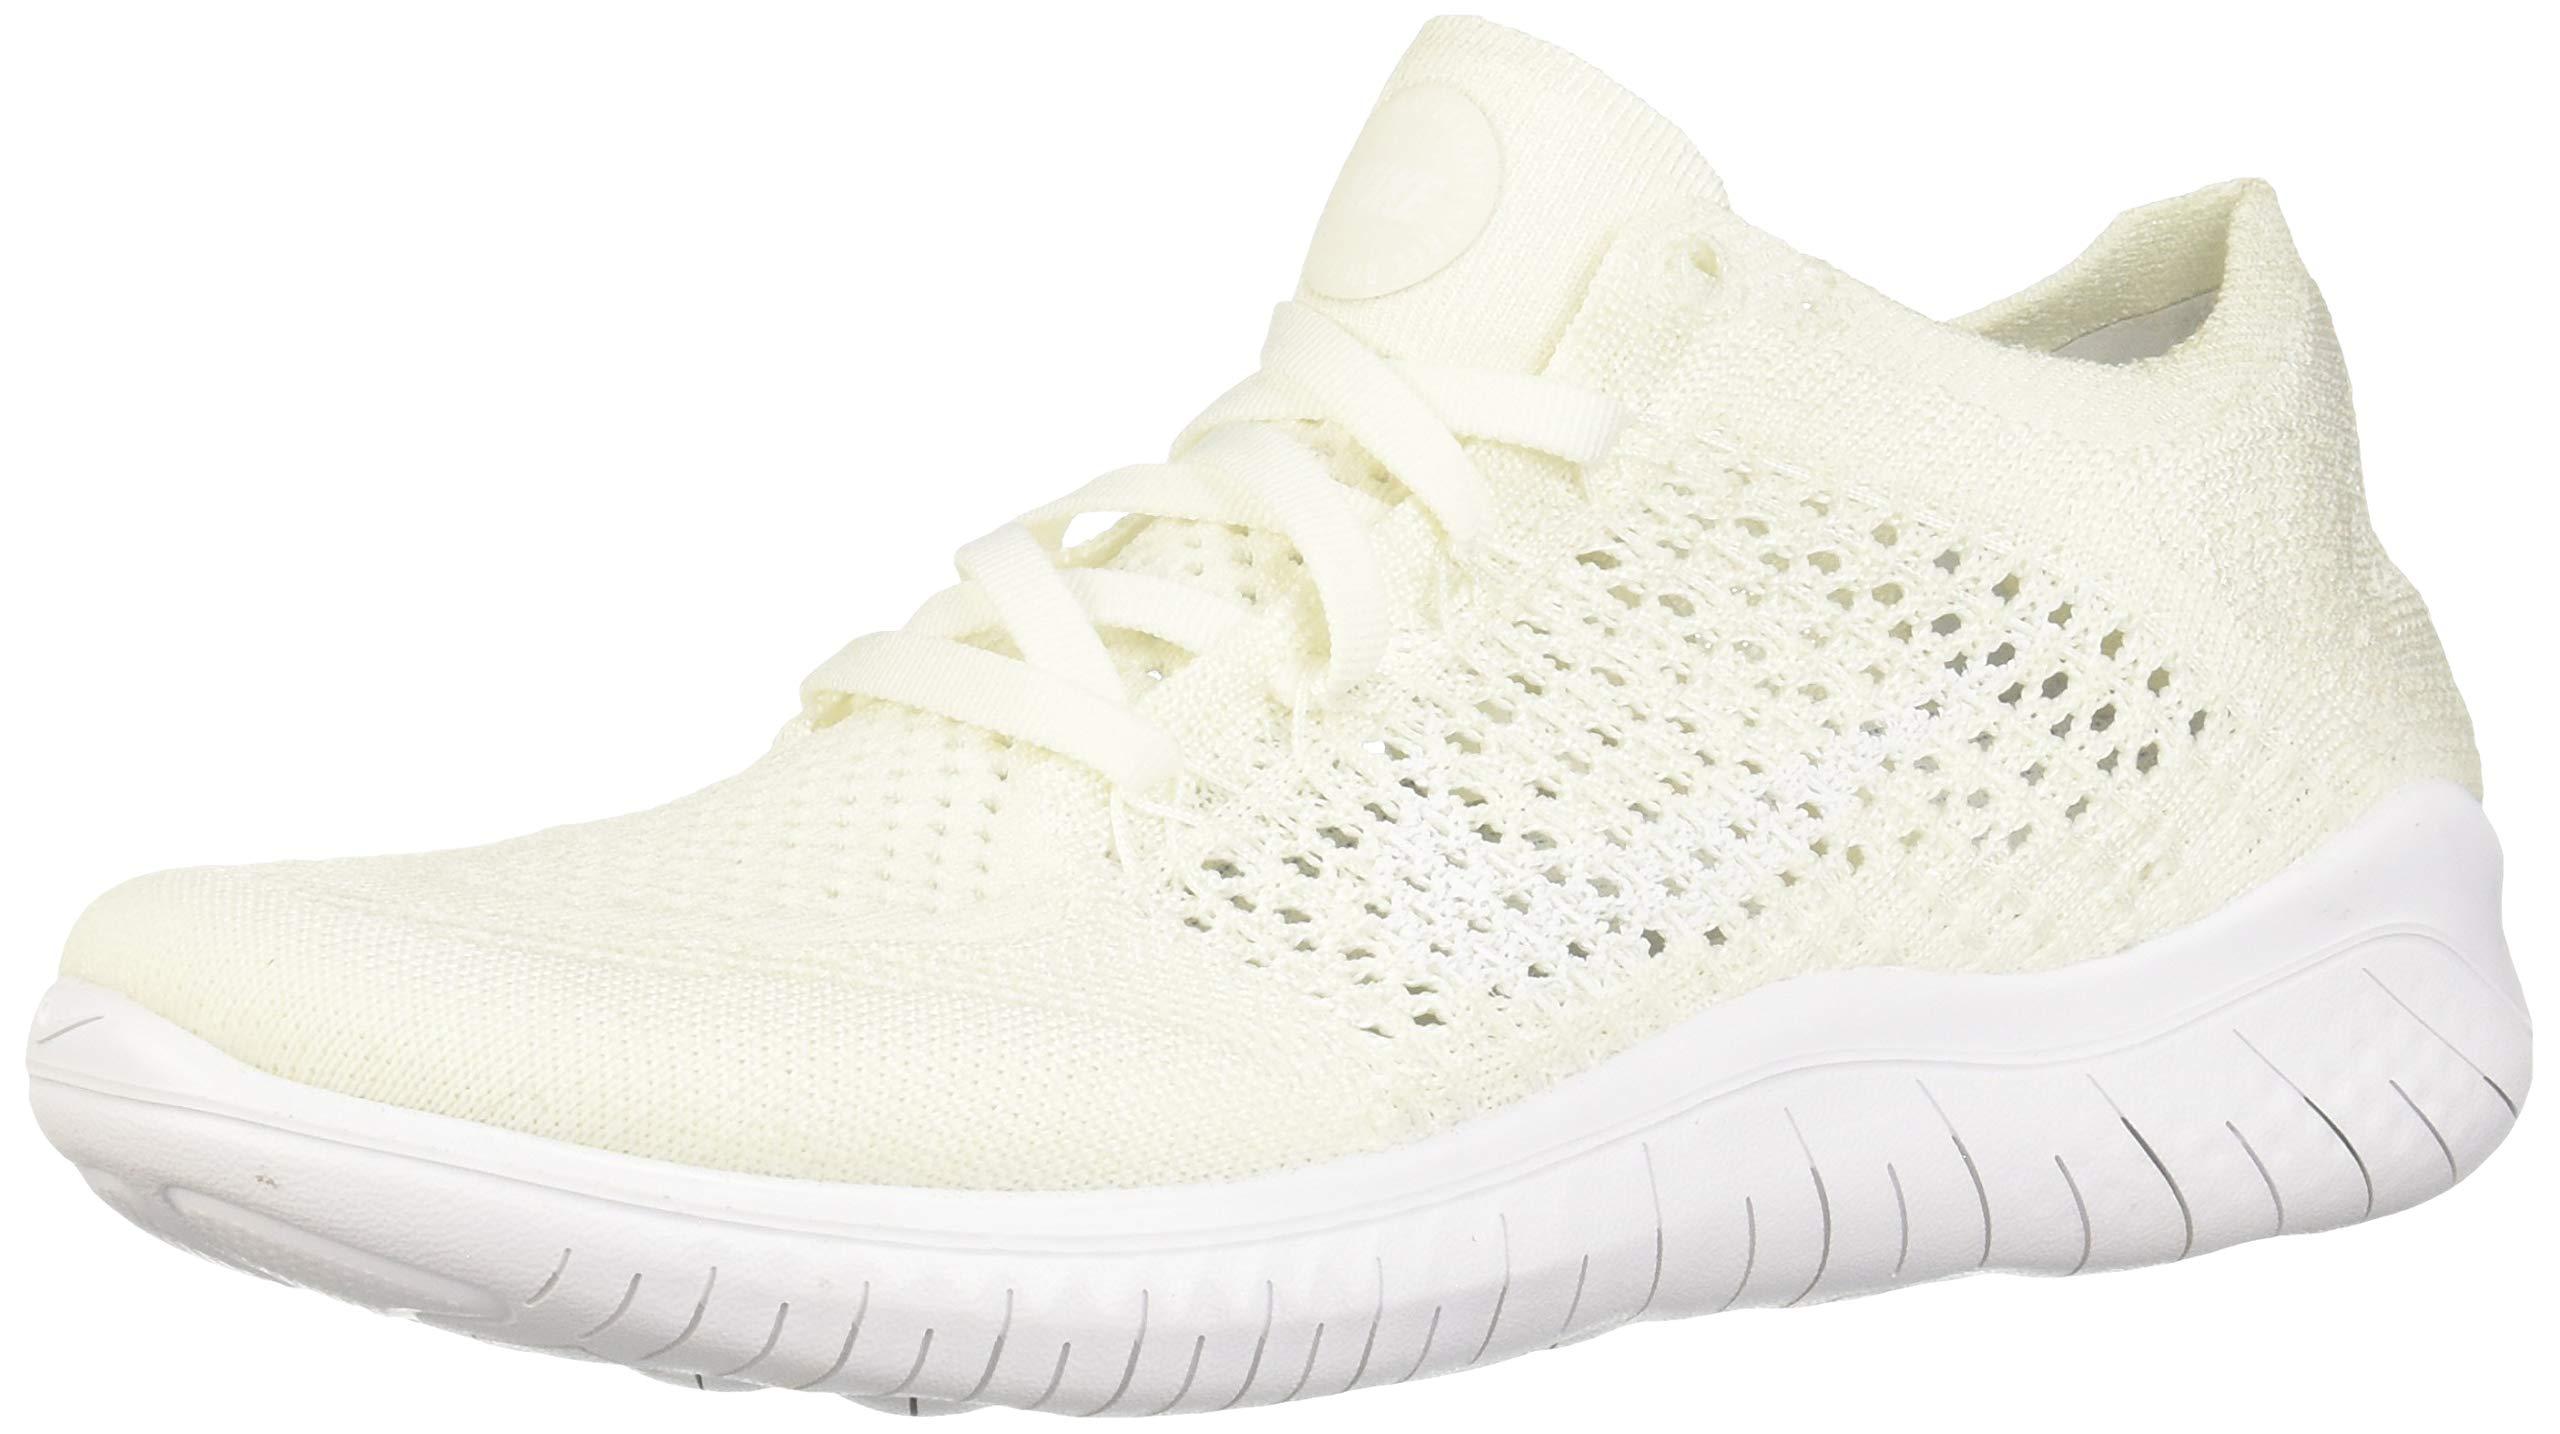 Nike Women's Free Rn Flyknit 2018 Running Shoe (6 M US, White/White)